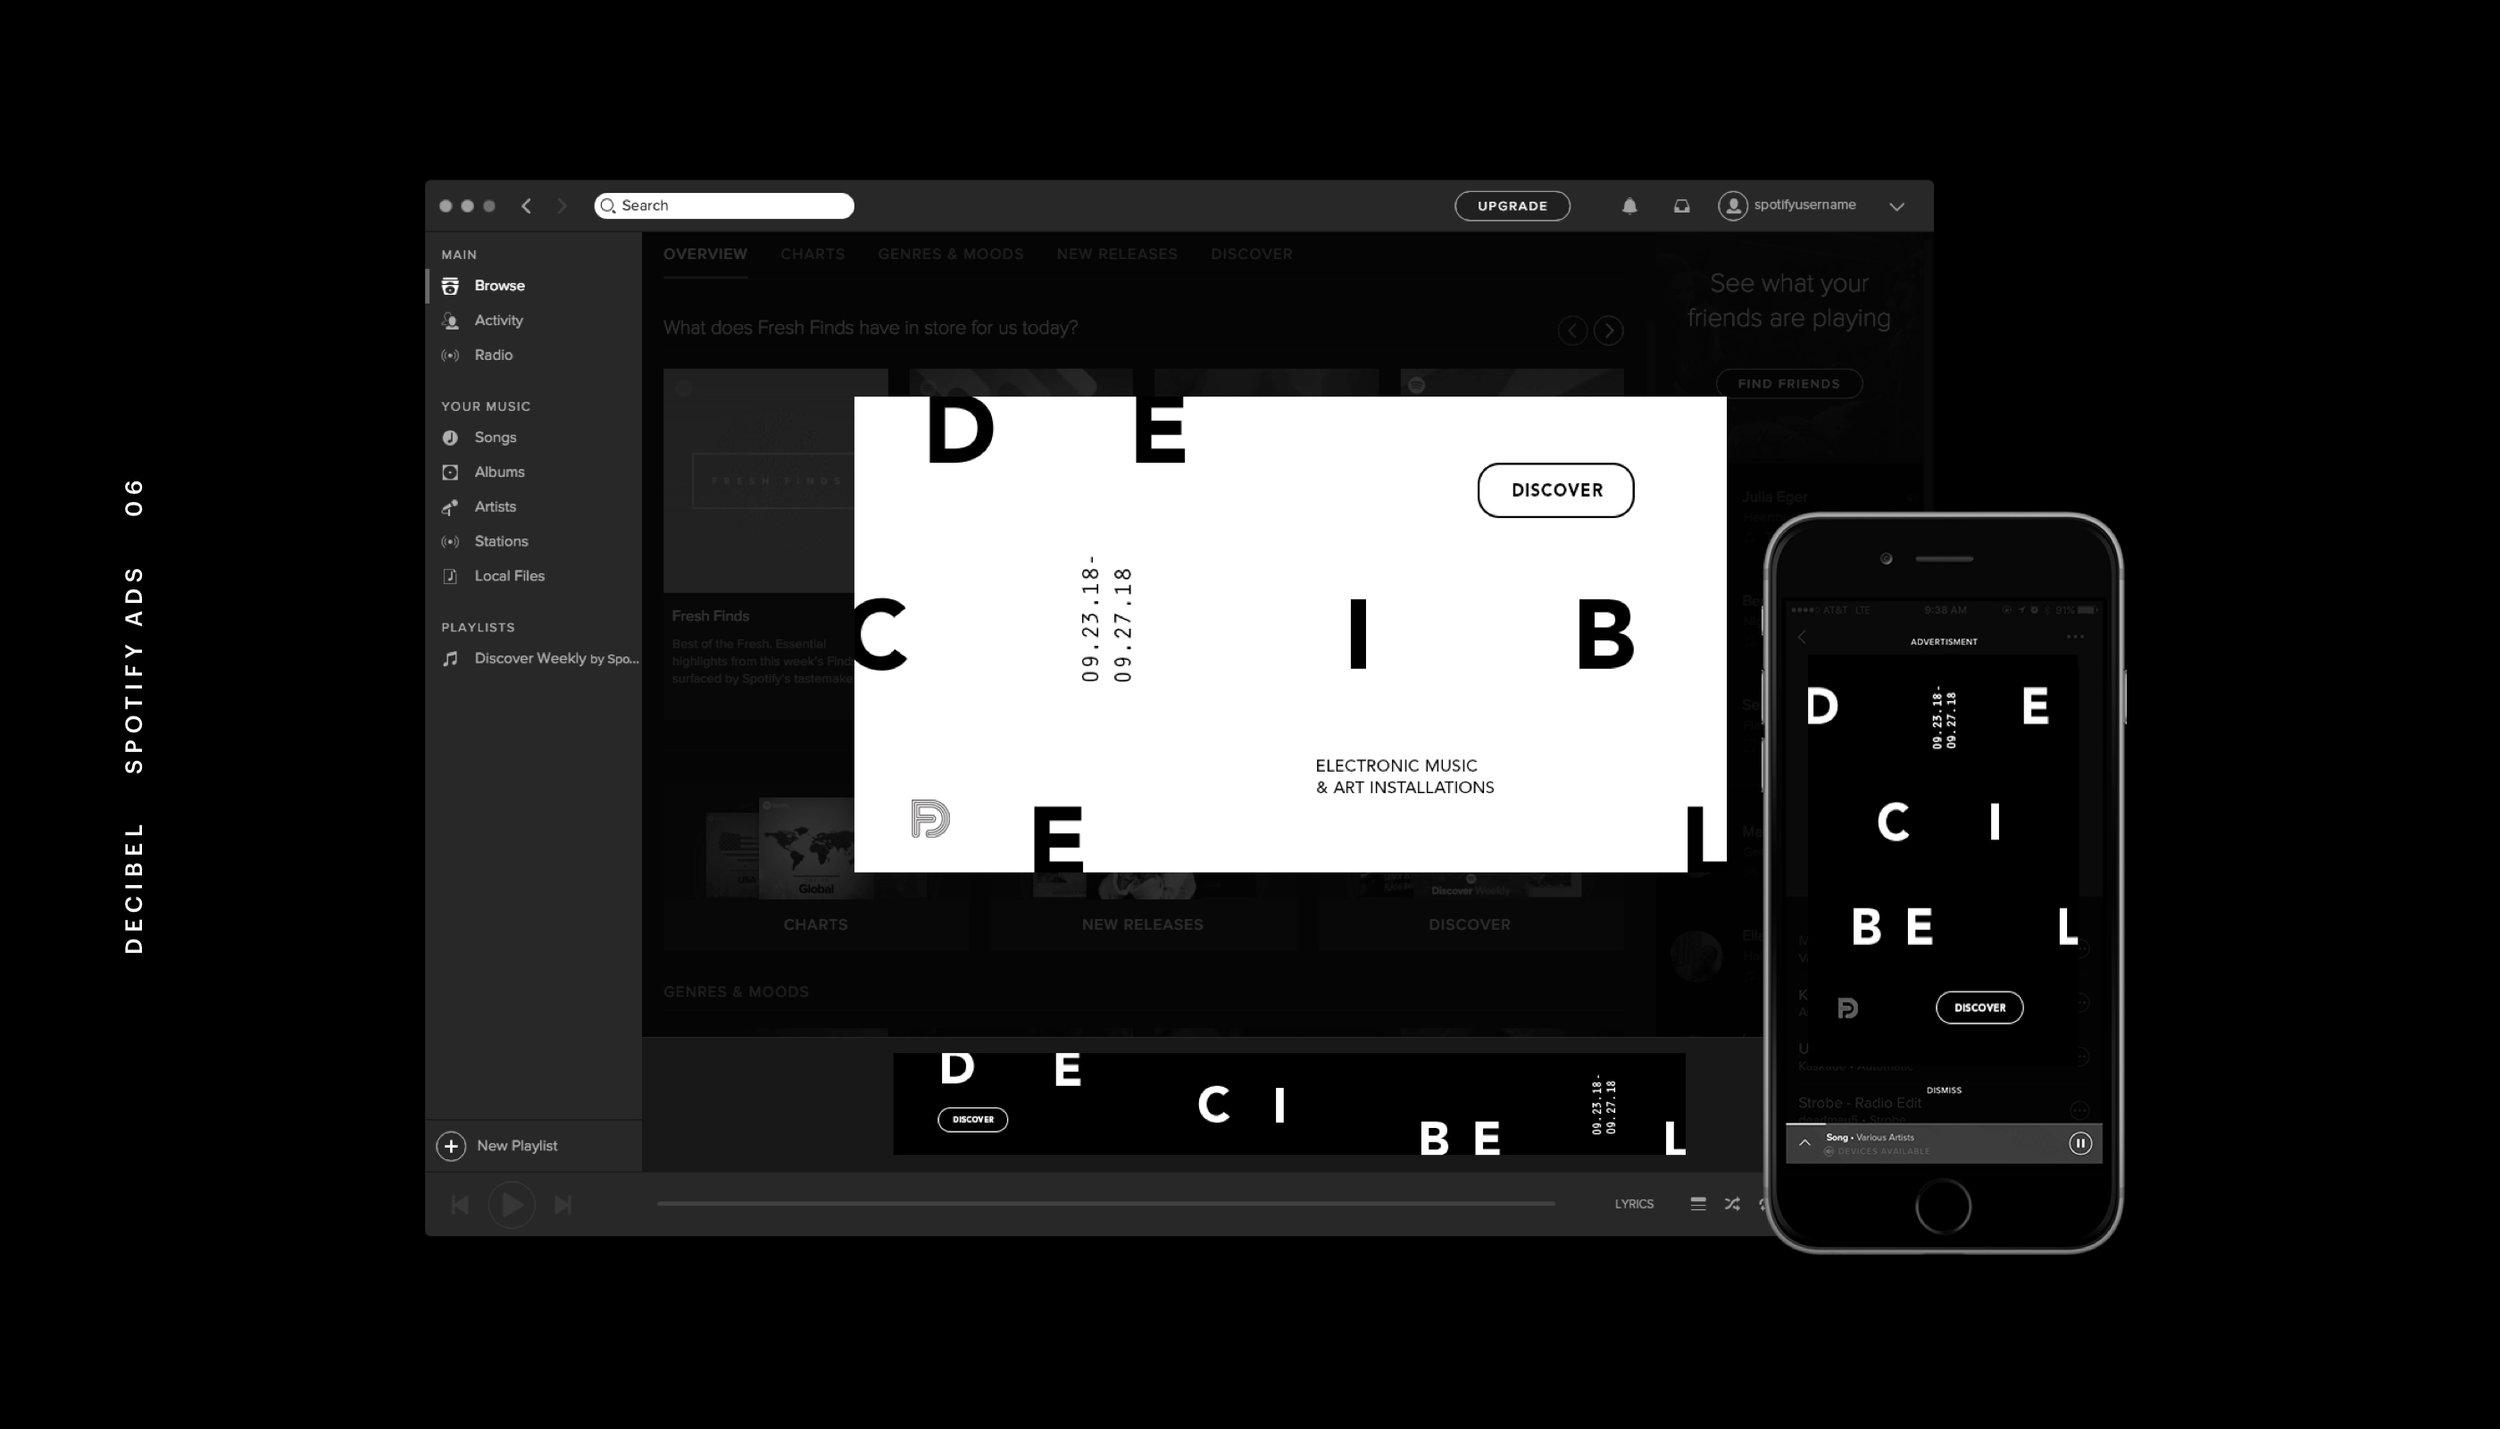 McKennaNicole_Decibel_Spotify_06.jpg